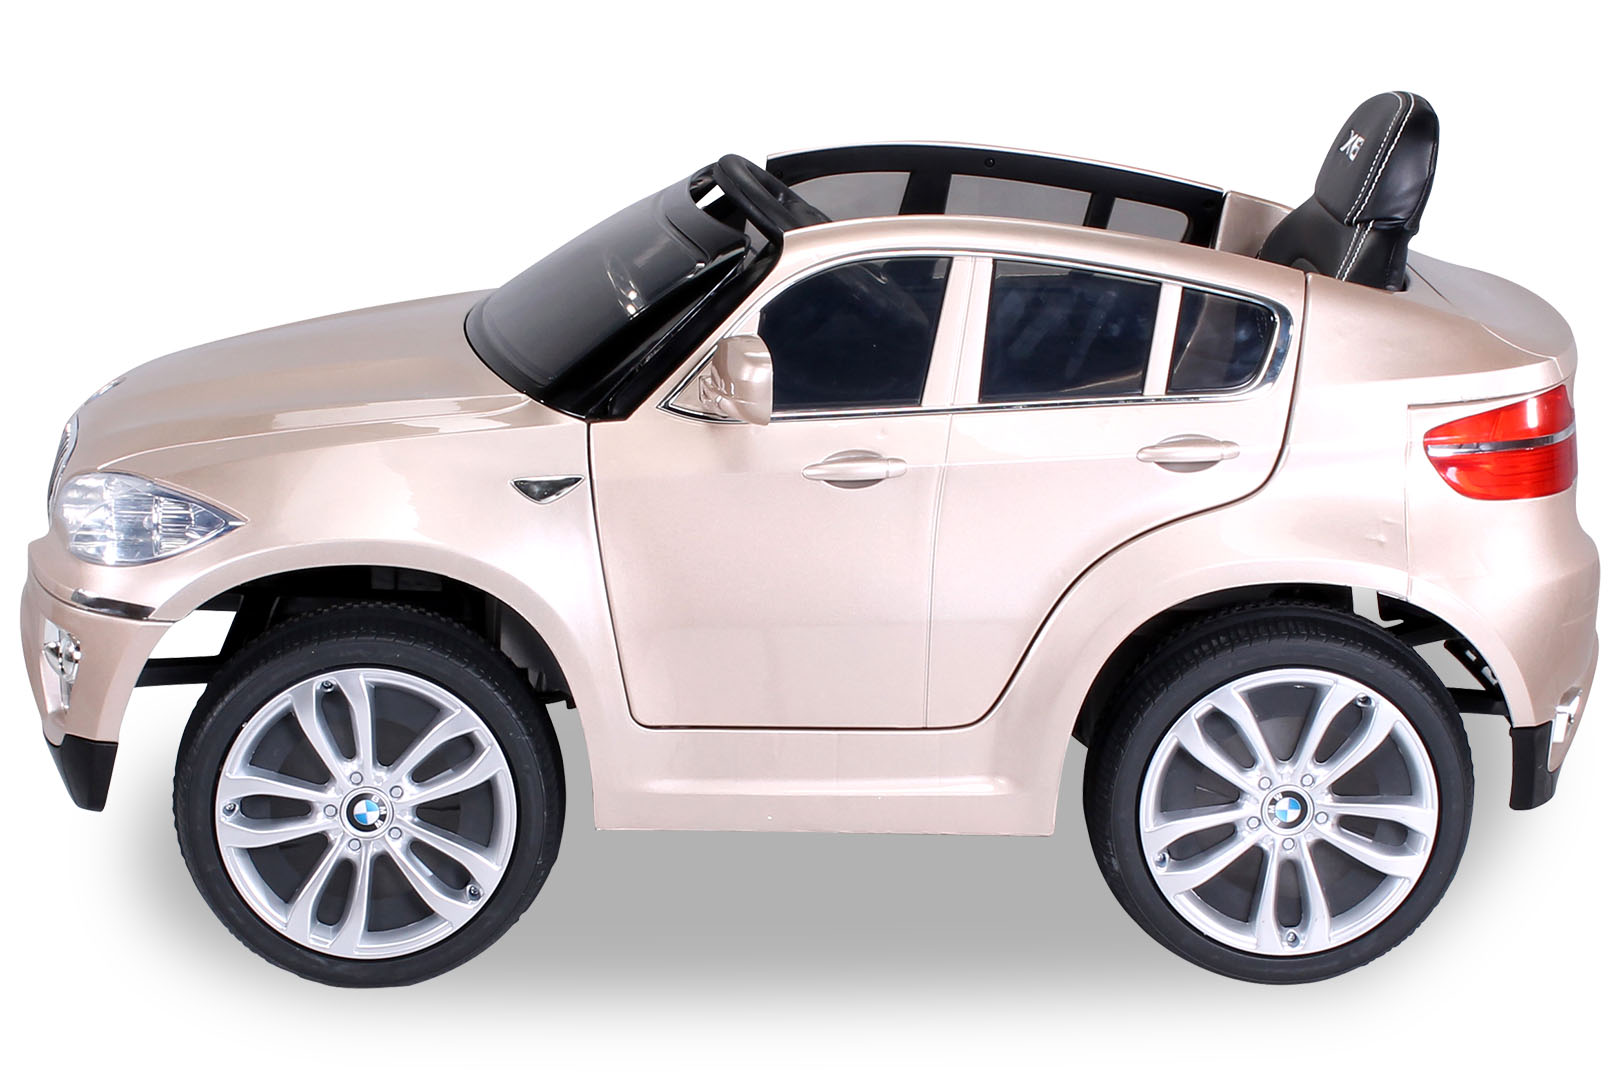 elektroauto bmw x6 suv kinderauto elektrofahrzeug kinder. Black Bedroom Furniture Sets. Home Design Ideas